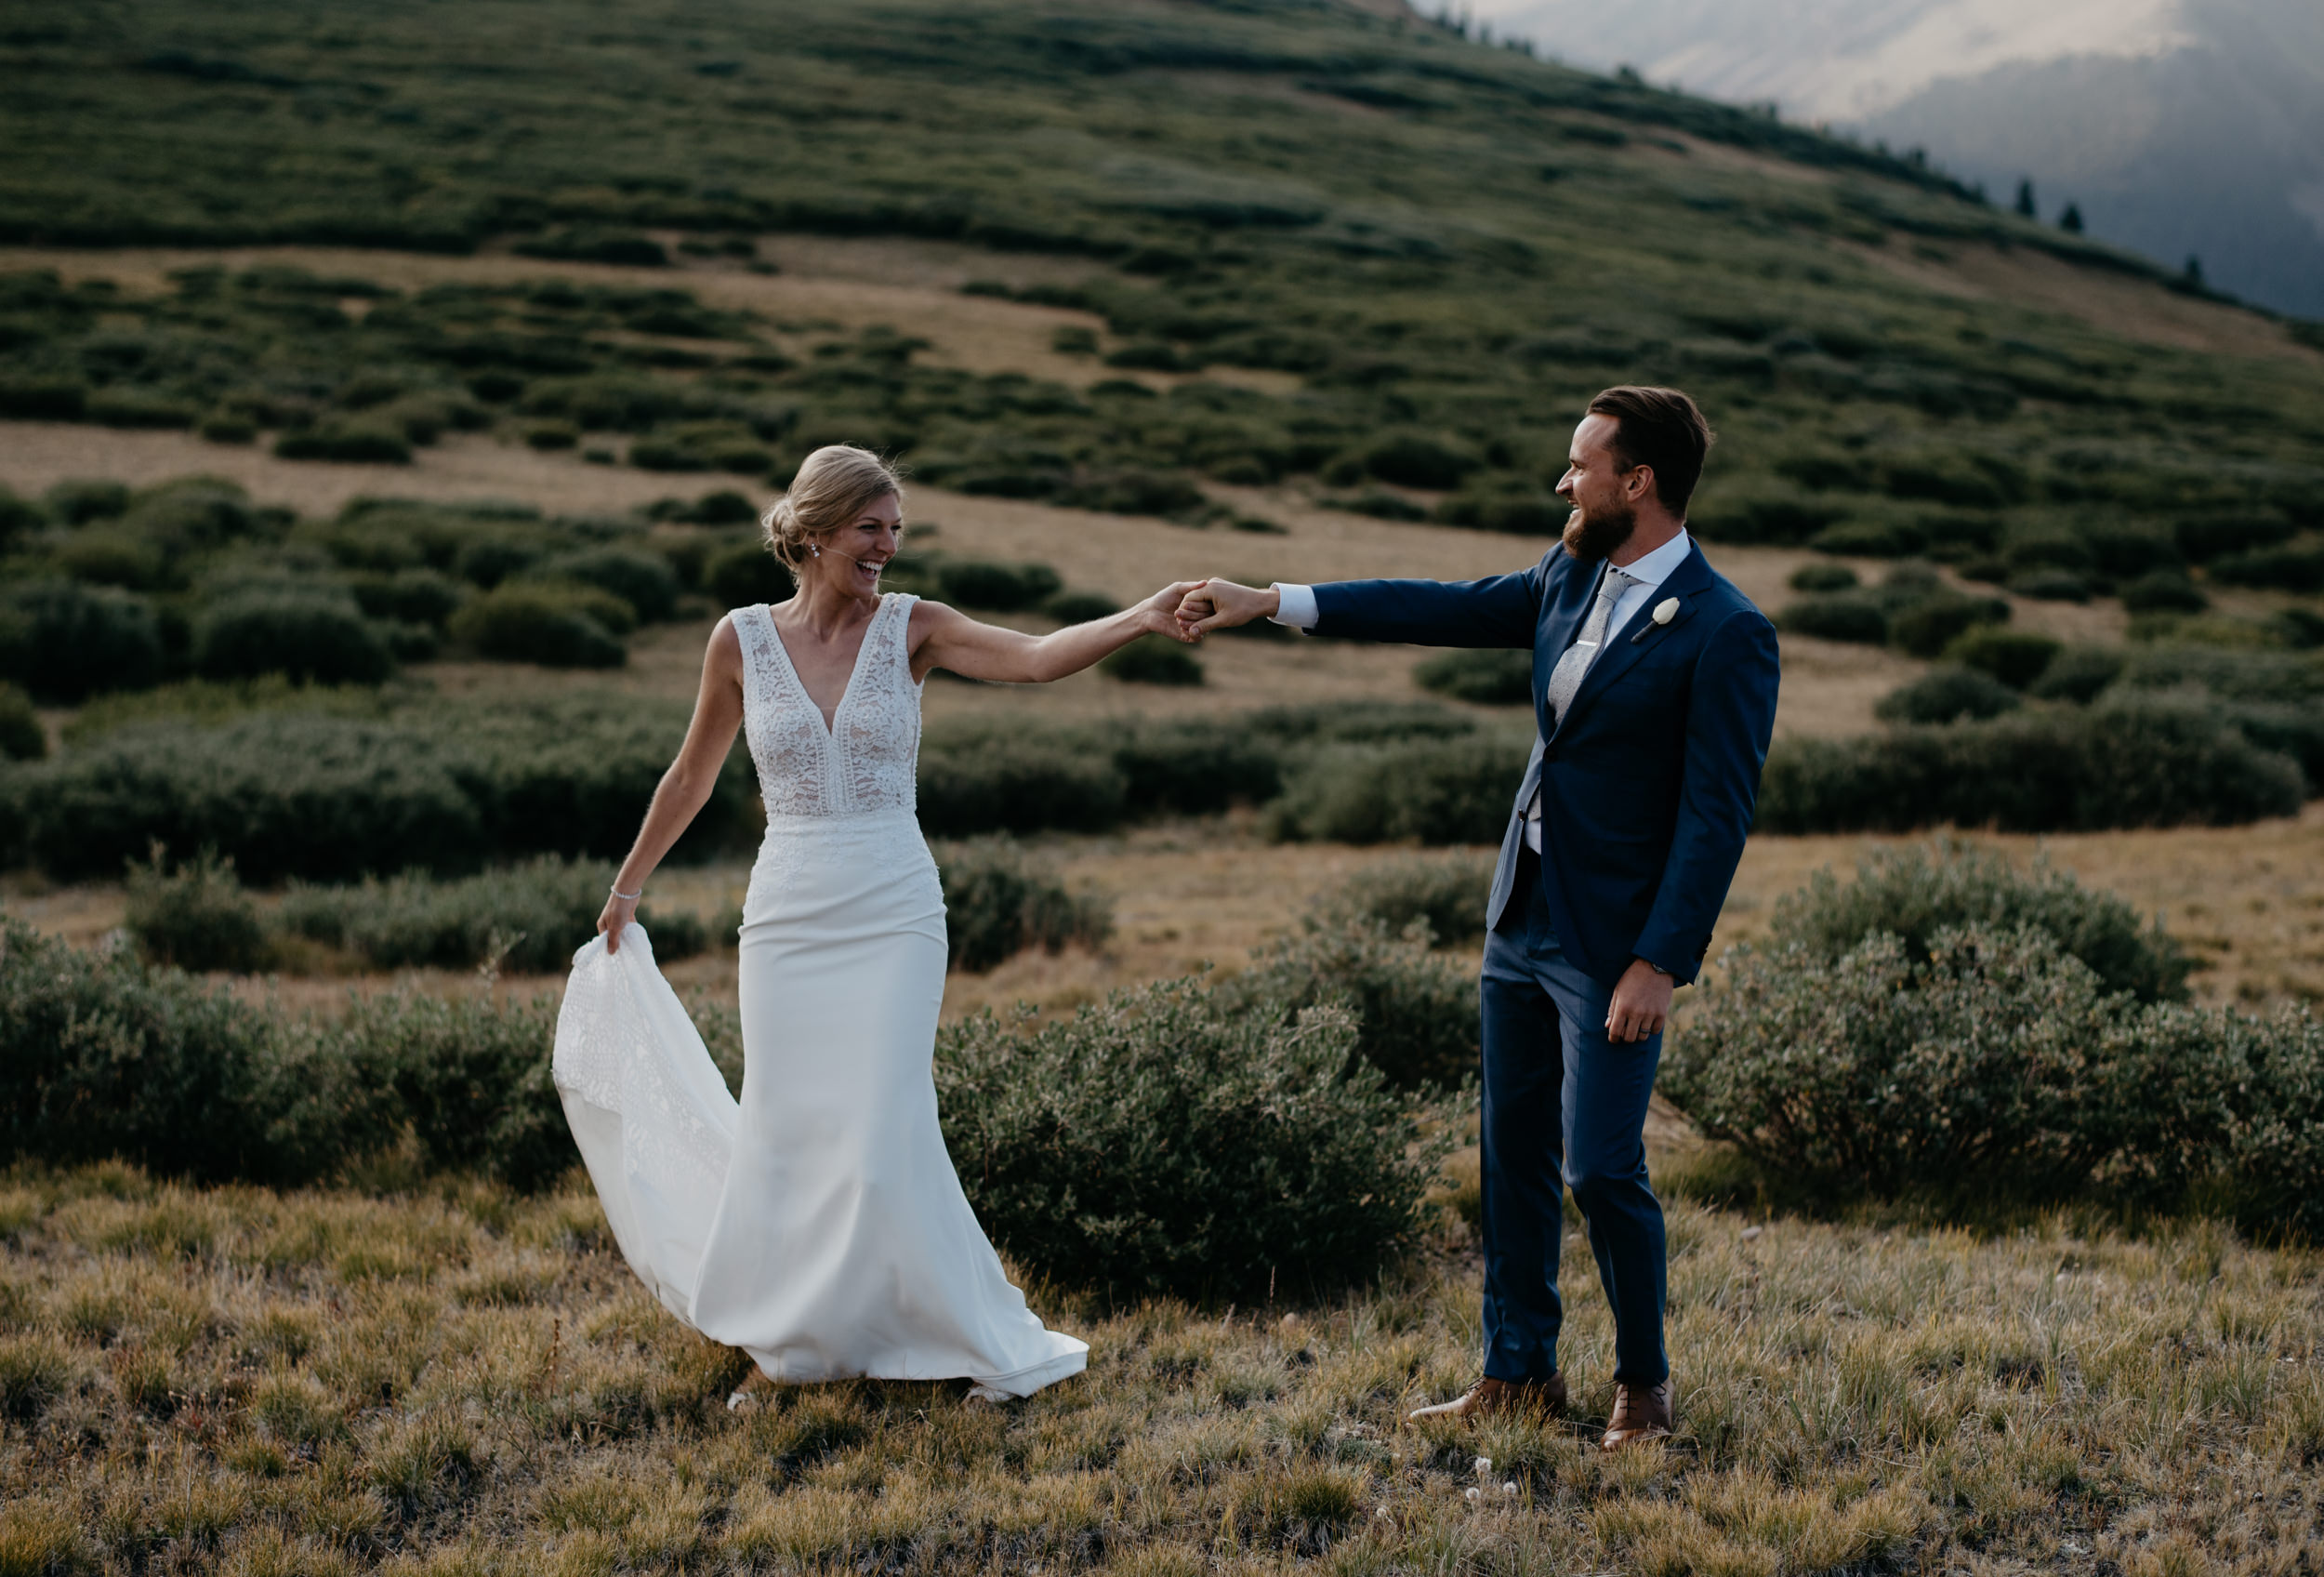 Bride and groom dancing at Georgetown wedding in Colorado. Colorado elopement and wedding photography.